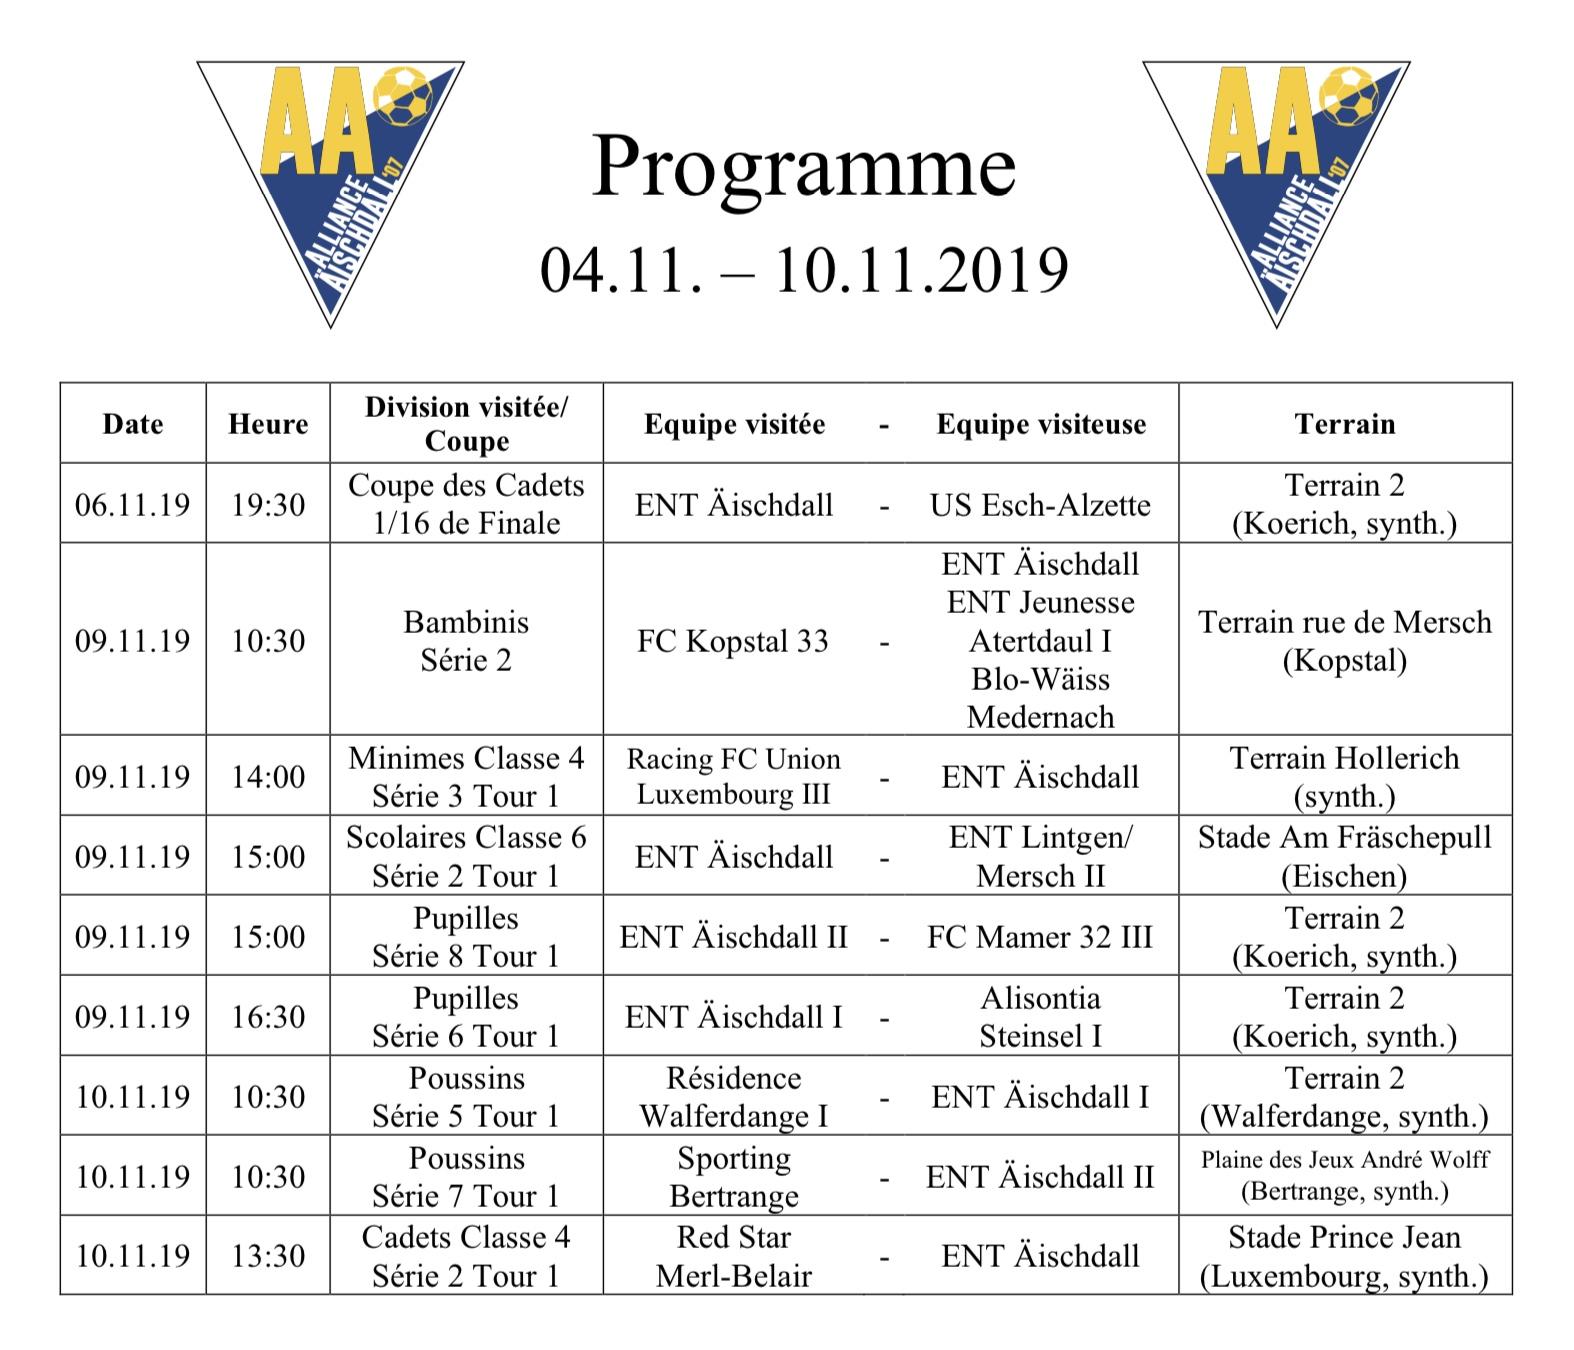 Programm 04.11.-10.11.2019